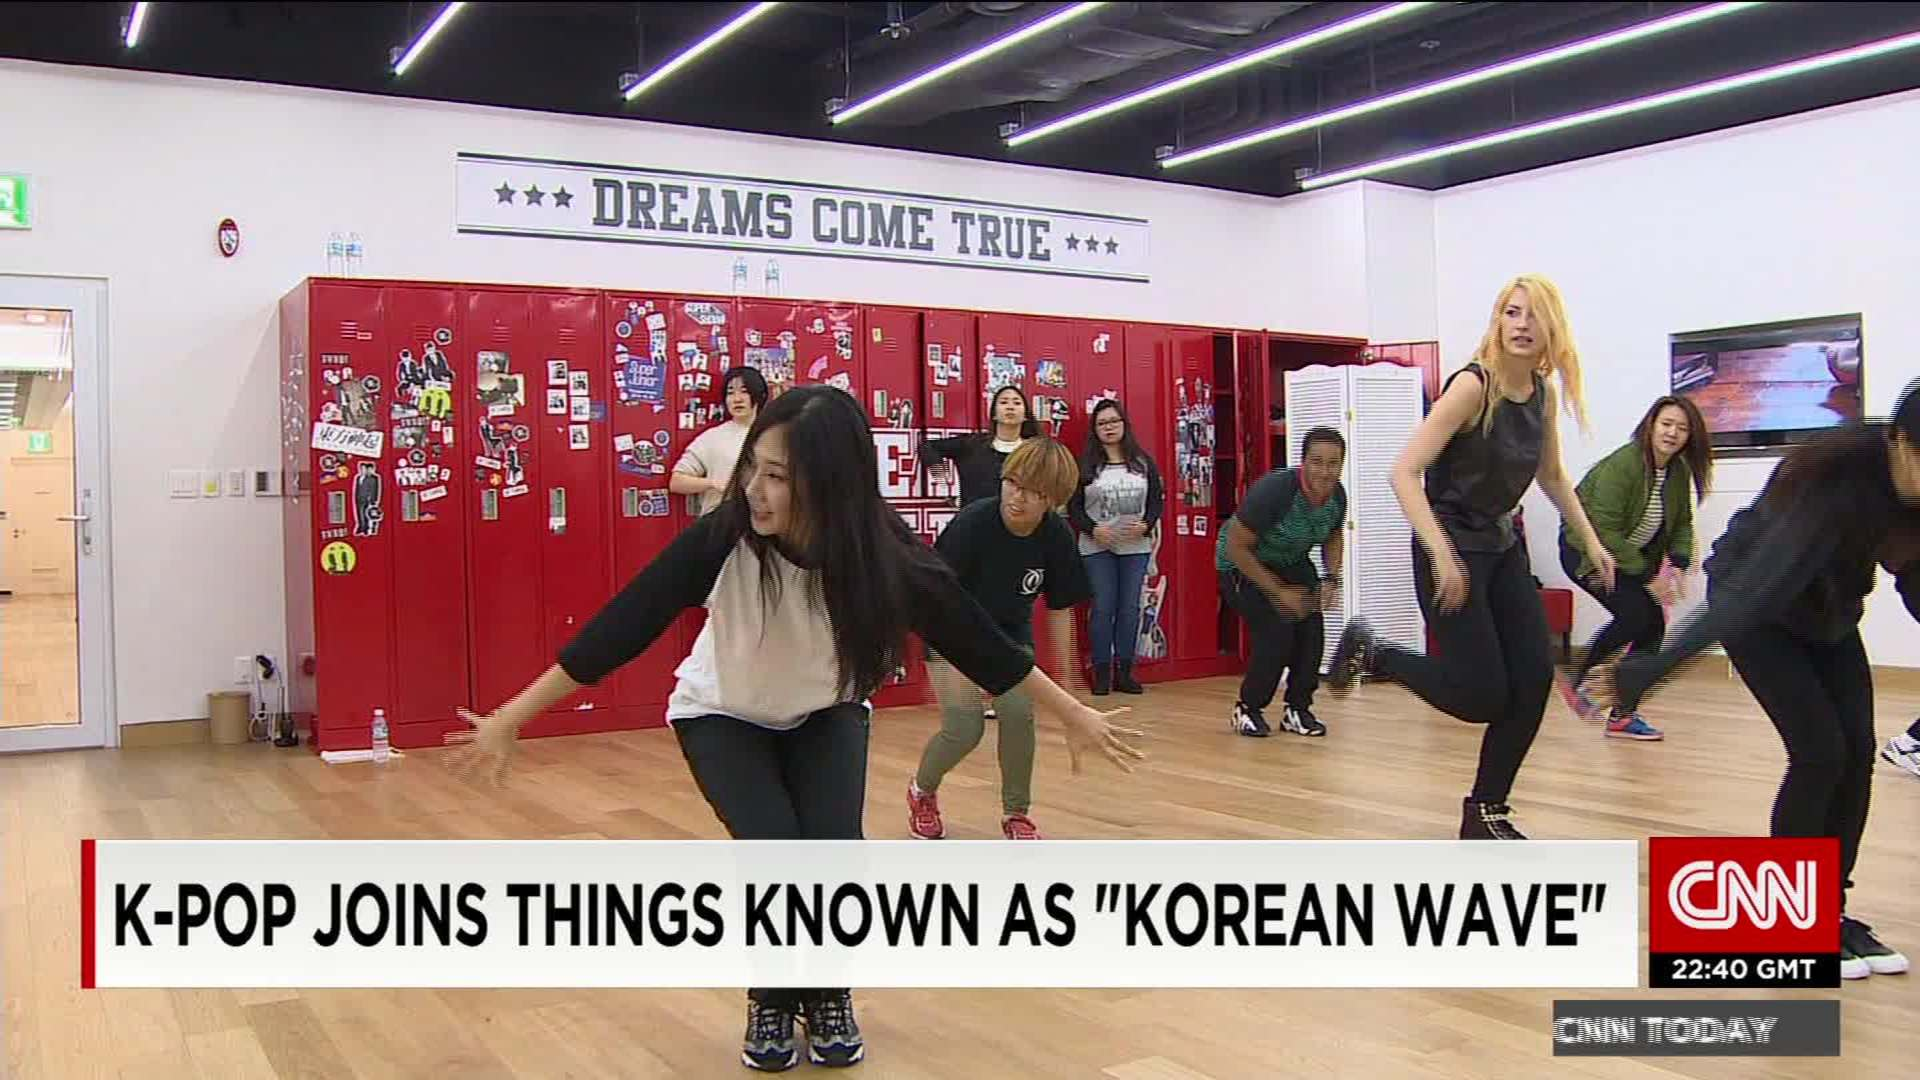 K-pop: Seoul neighborhood rides the Korean wave | CNN Travel